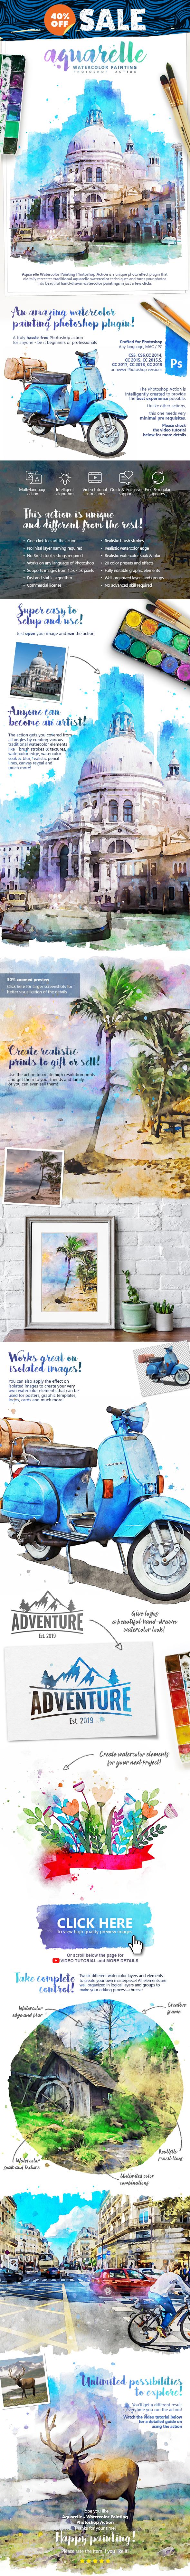 Aquarelle - Watercolor Painting Photoshop Action